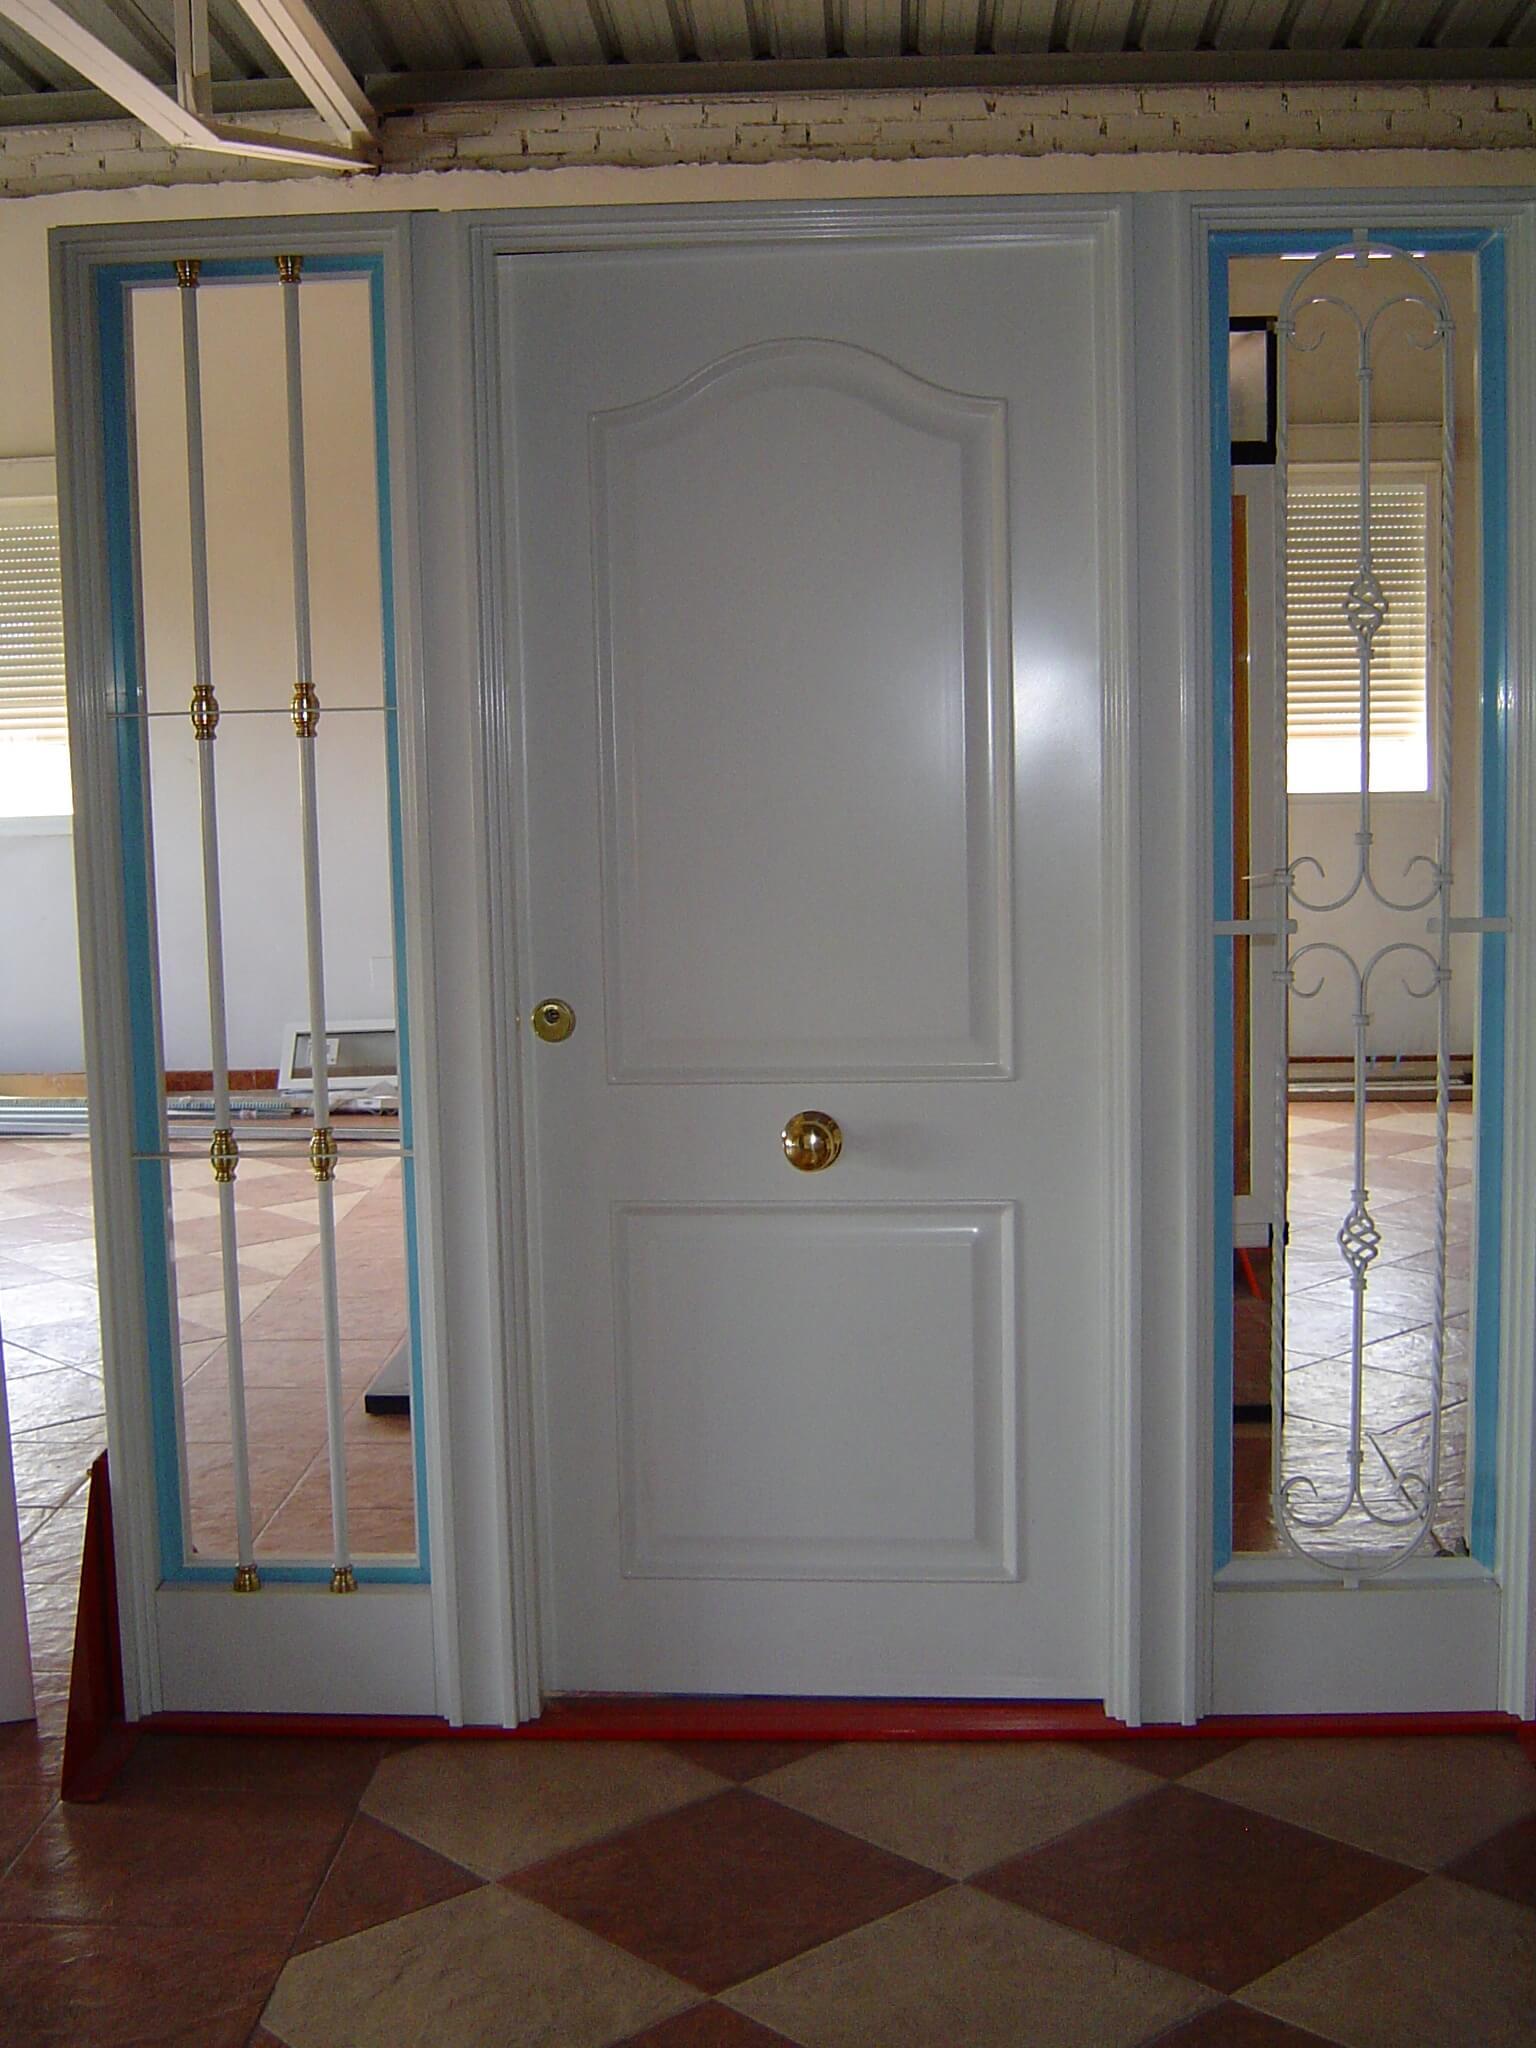 Puertas metalicas exterior baratas amazing beste ideen for Puertas exteriores baratas